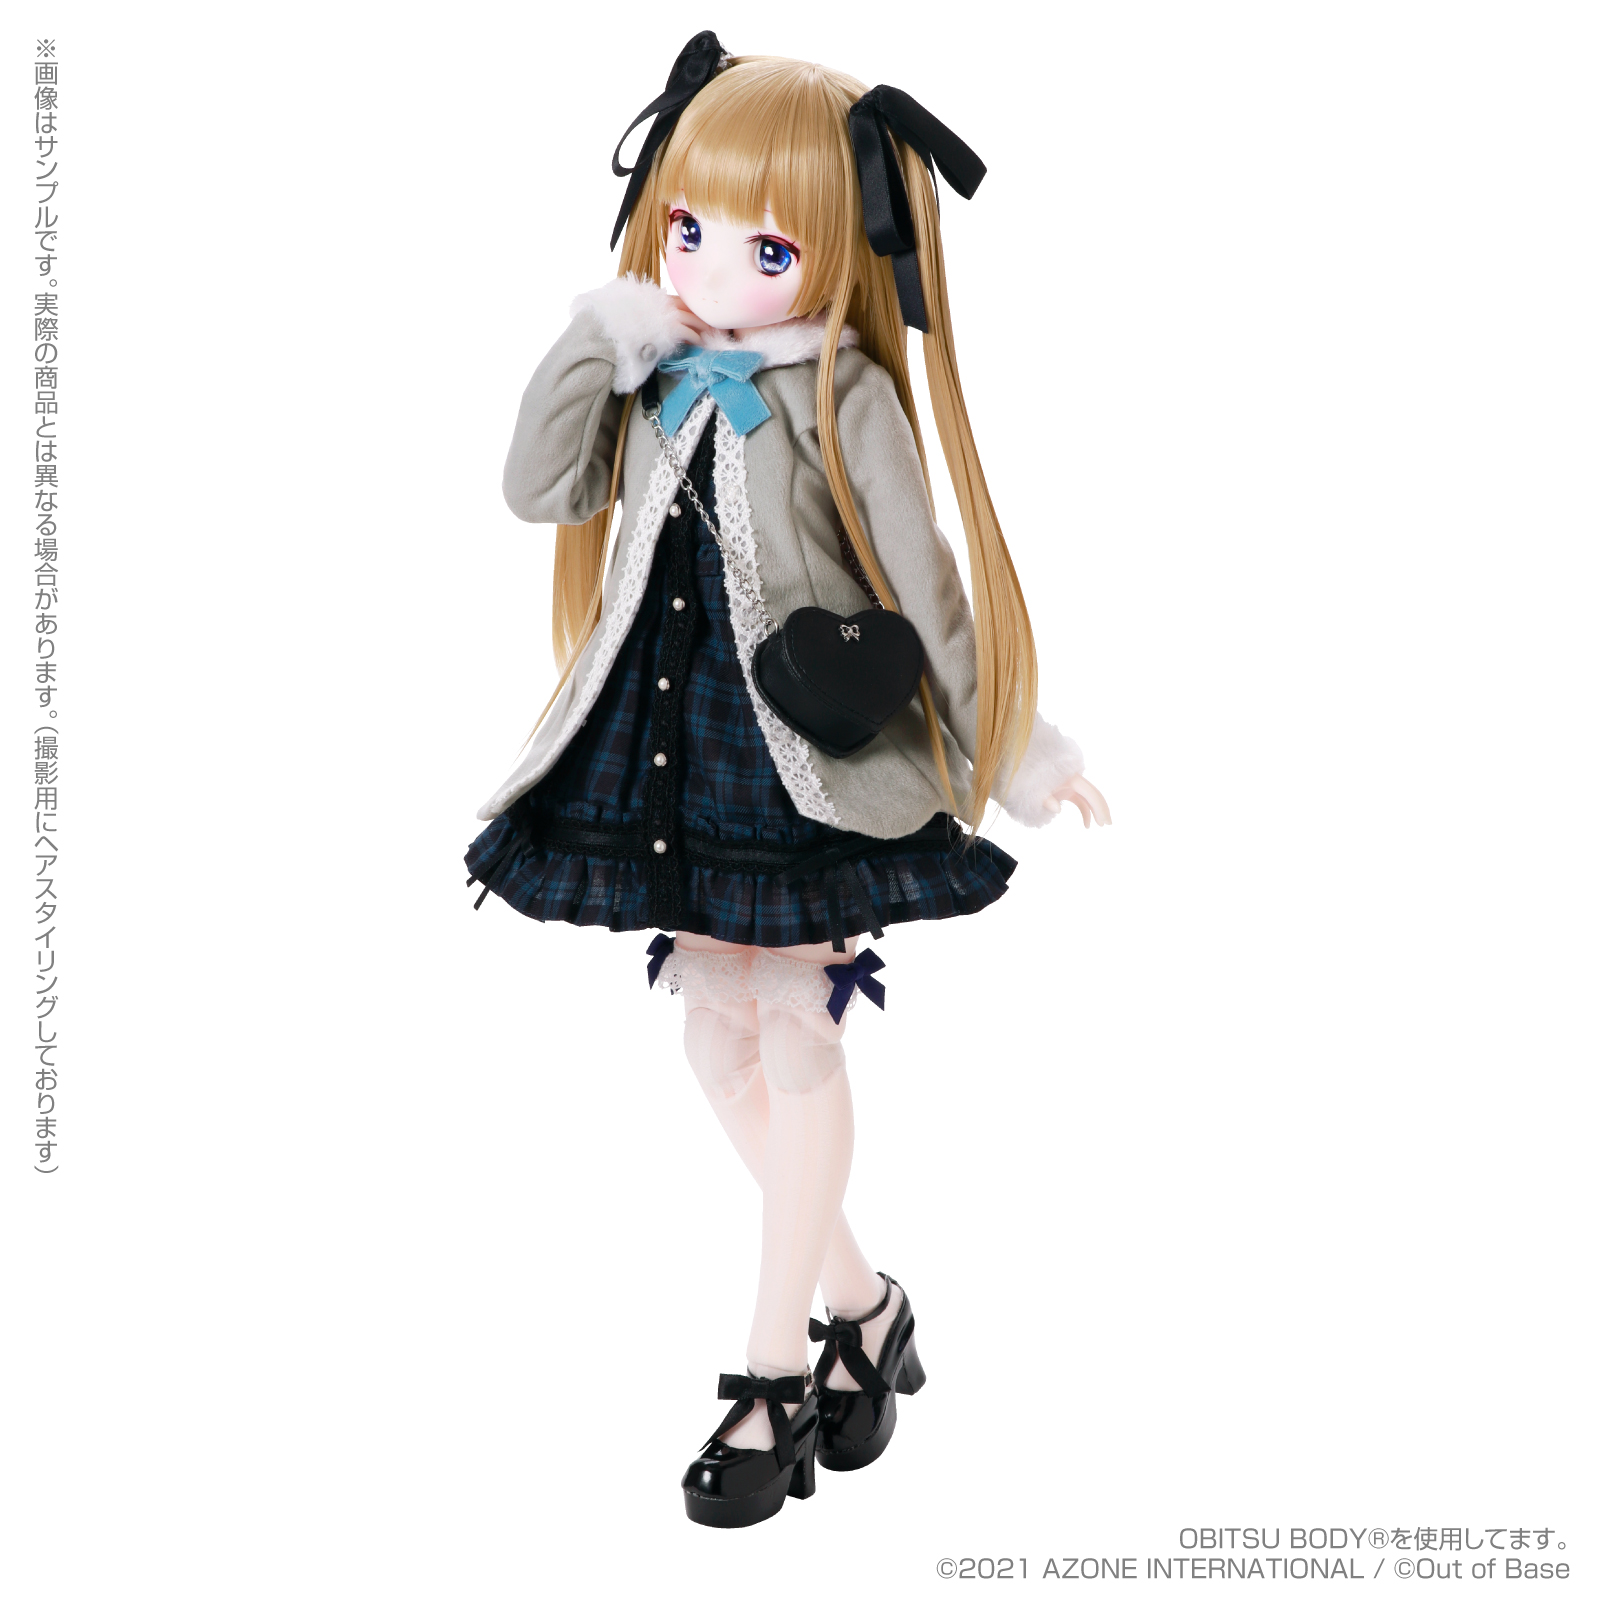 Iris Collect petit『あんな/~Wonder fraulein~Eternal Princess(通常販売ver.)』1/3 完成品ドール-007